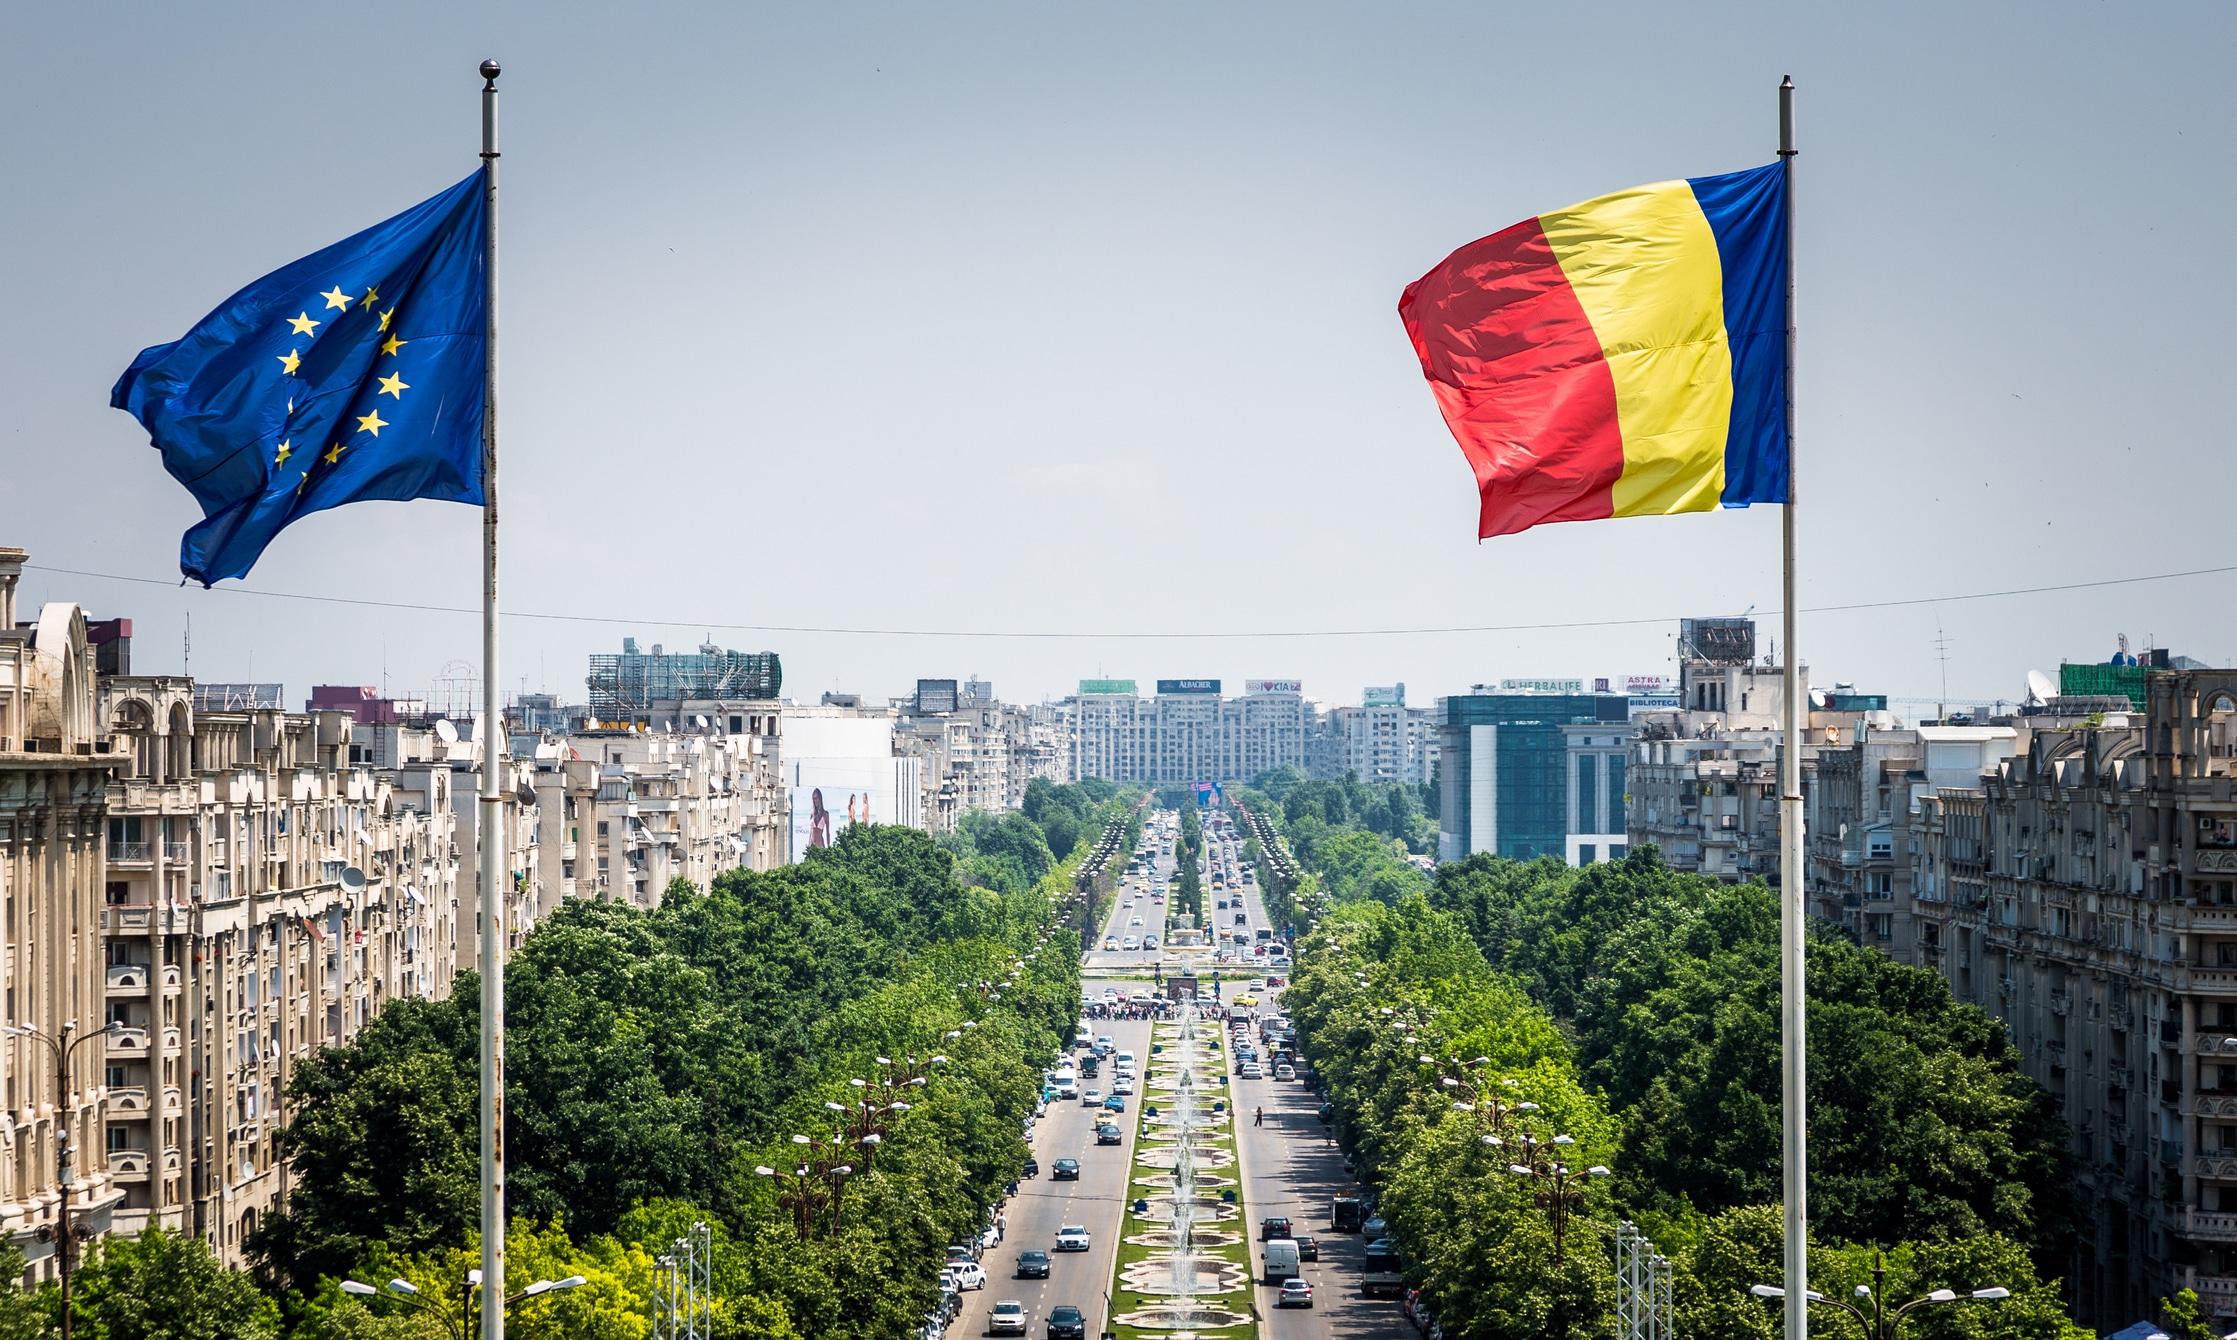 Executive Search in Romania